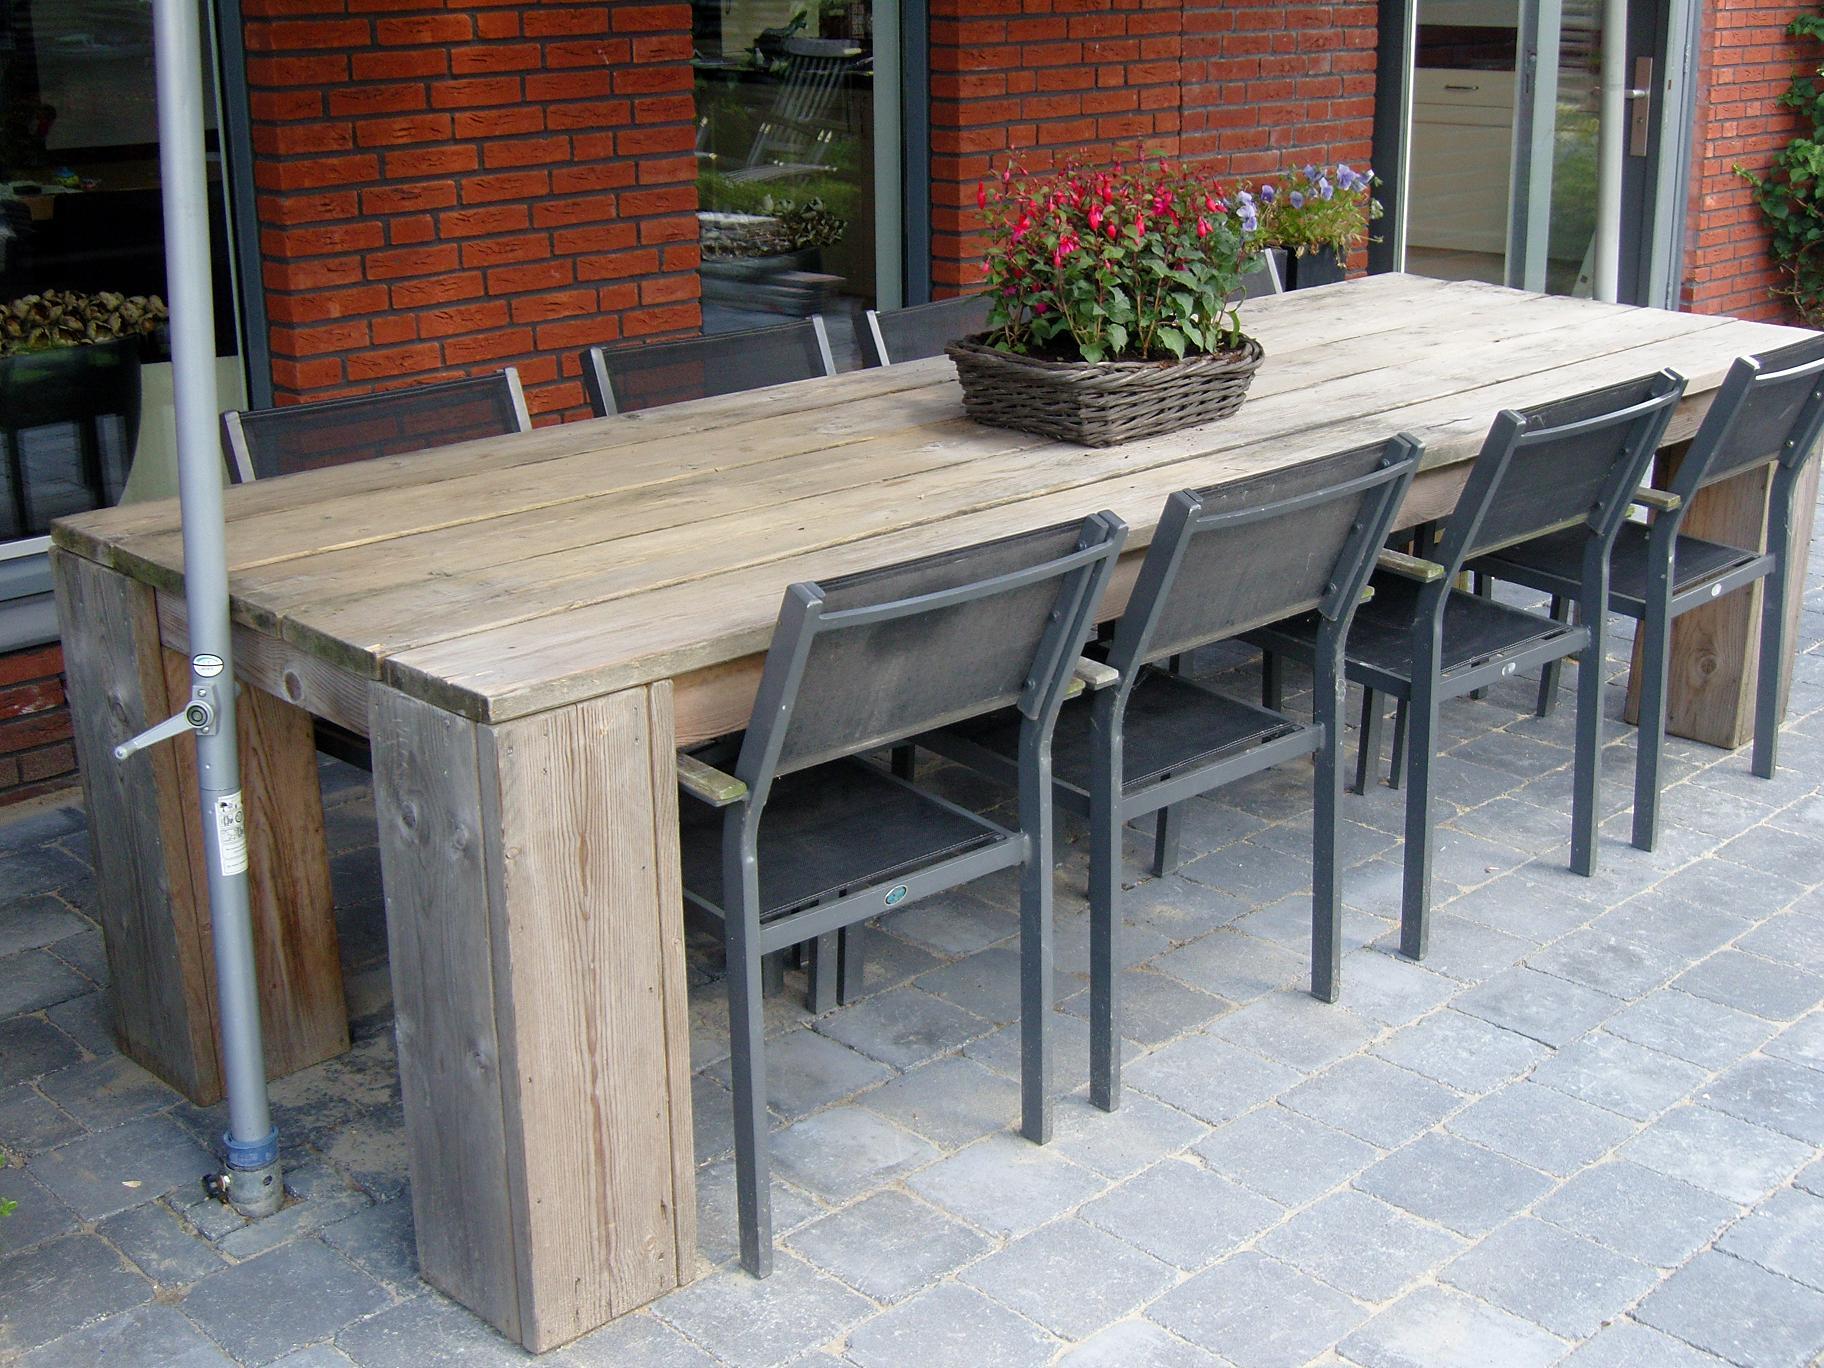 Steigerhouten meubelen tuintafels de steigerhout fabriek for Steigerhout tuintafel